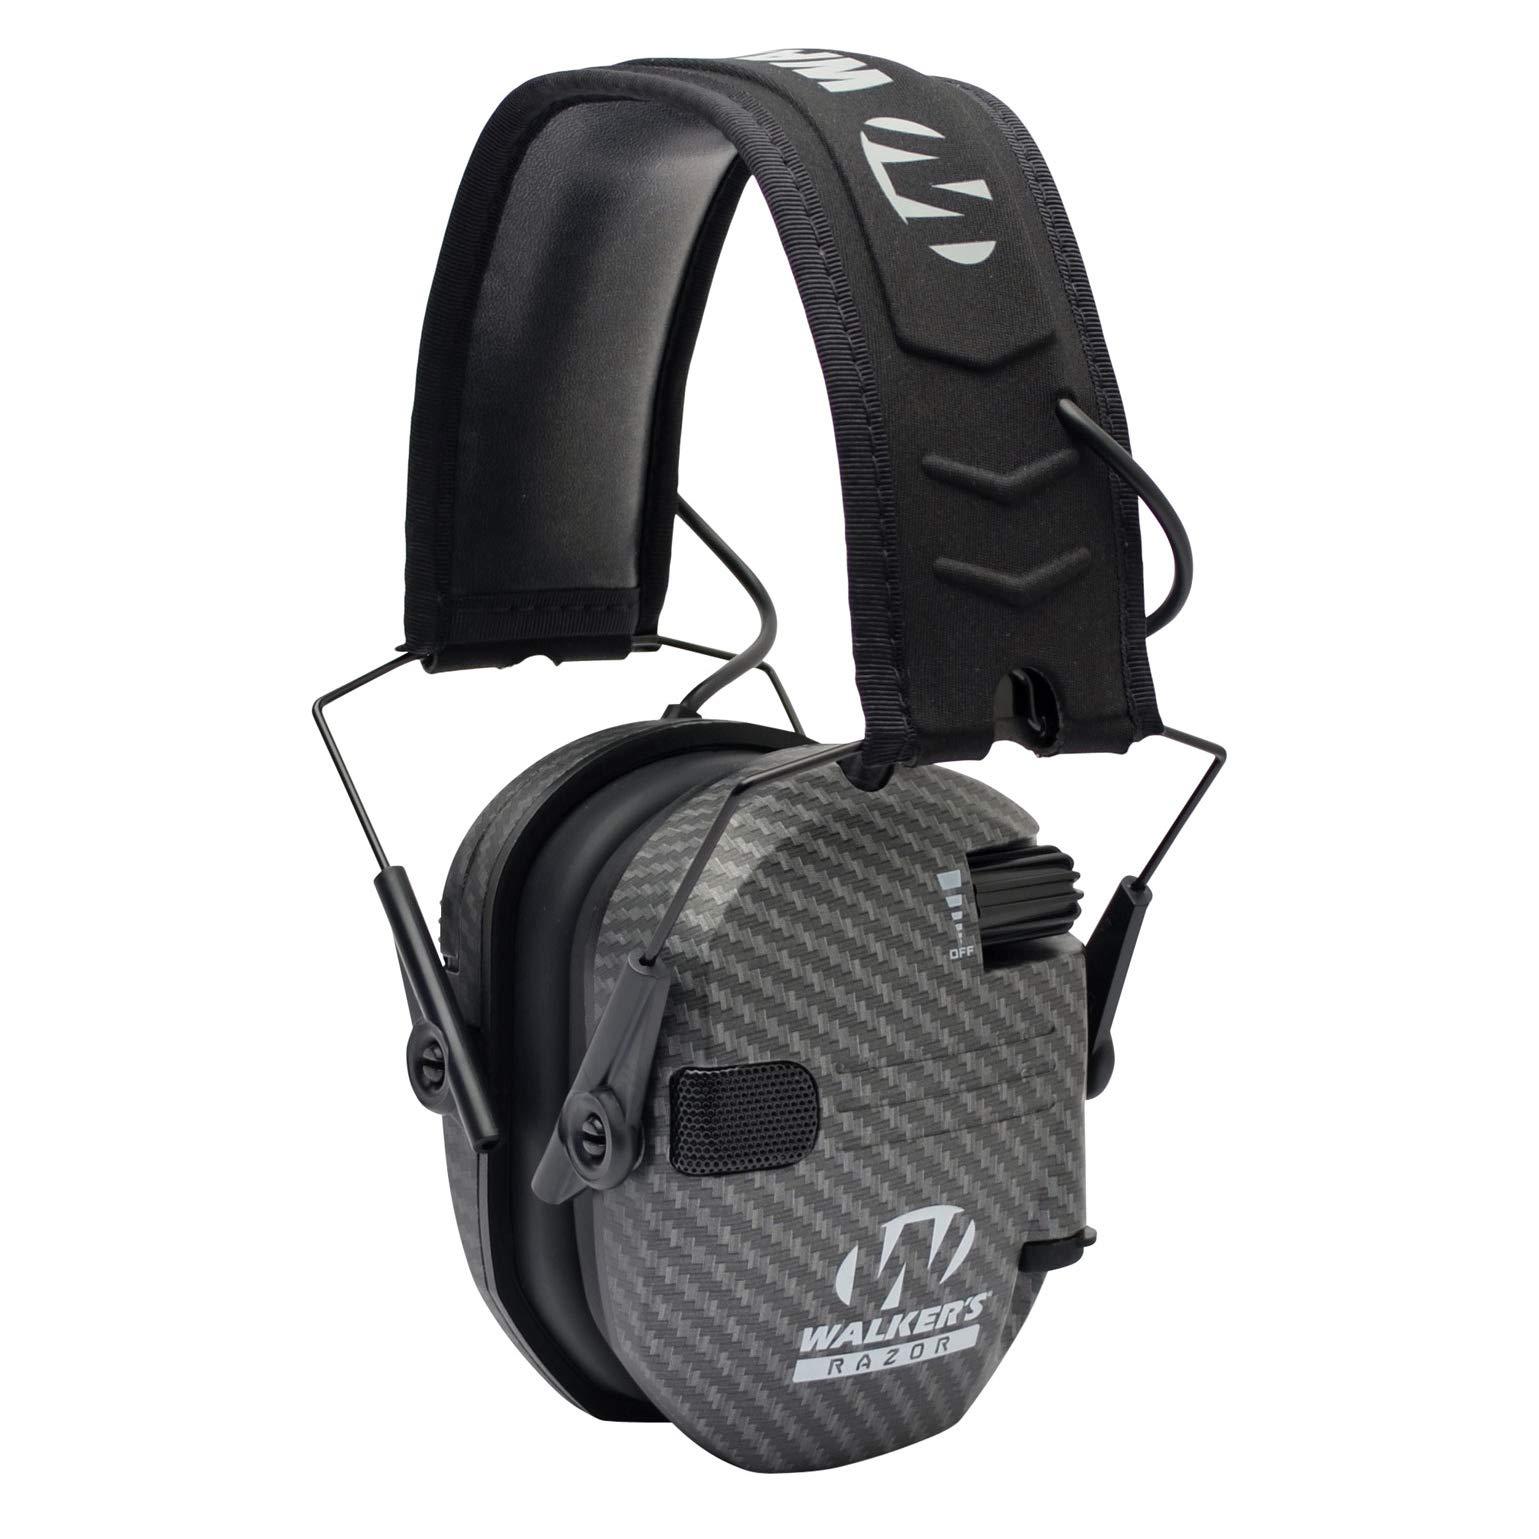 Walkers Game Ear Walker's Razor Slim Electronic Muff - Carbon